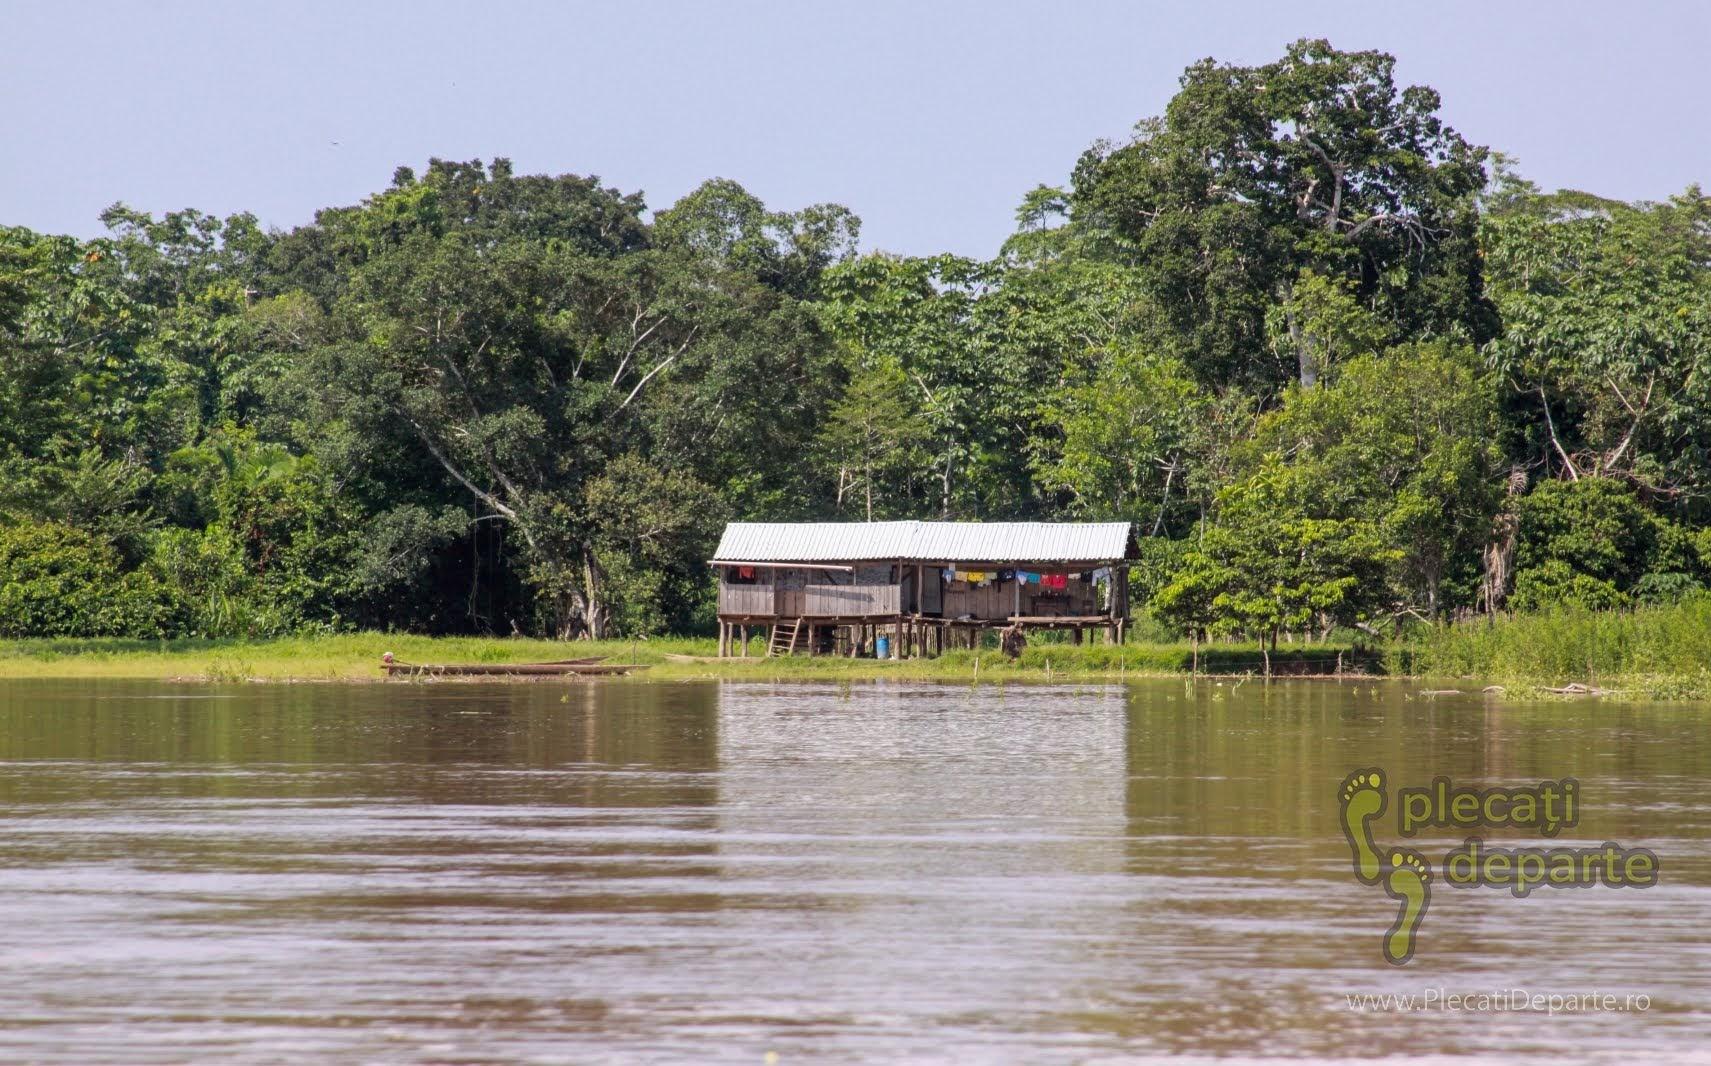 Casa izolata pe raul Huallaga, afluent al fluviului Amazonian, in jungla amazoniana, in Peru